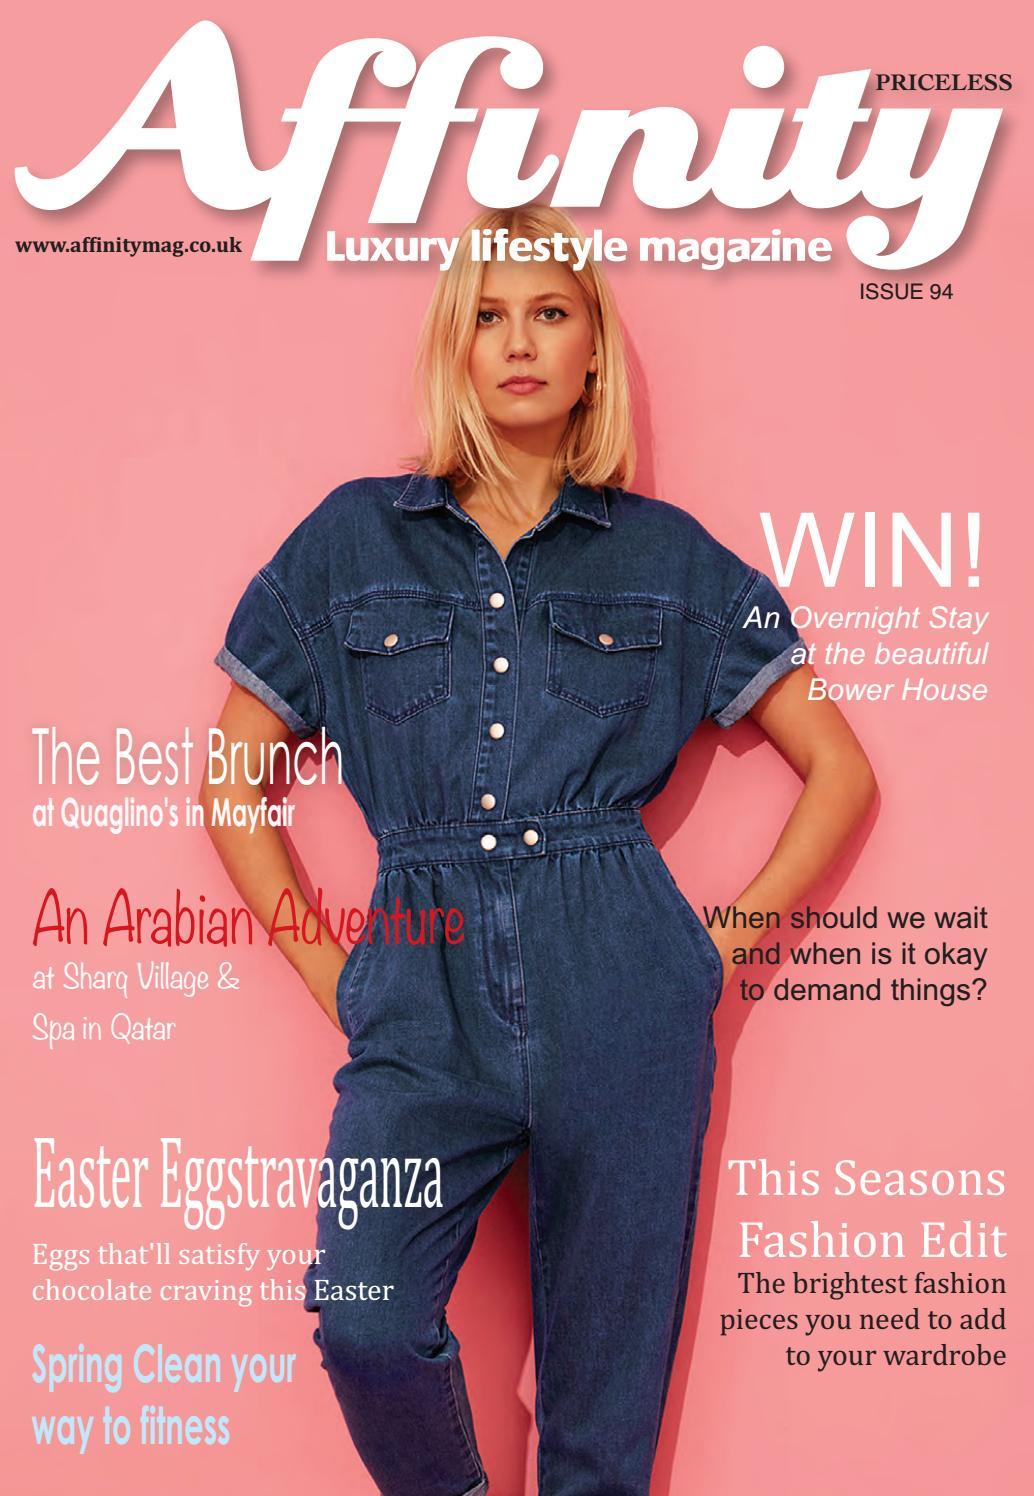 8a3d057de824 Affinity Luxury Lifestyle Magazine April 2019 by jane fry - issuu